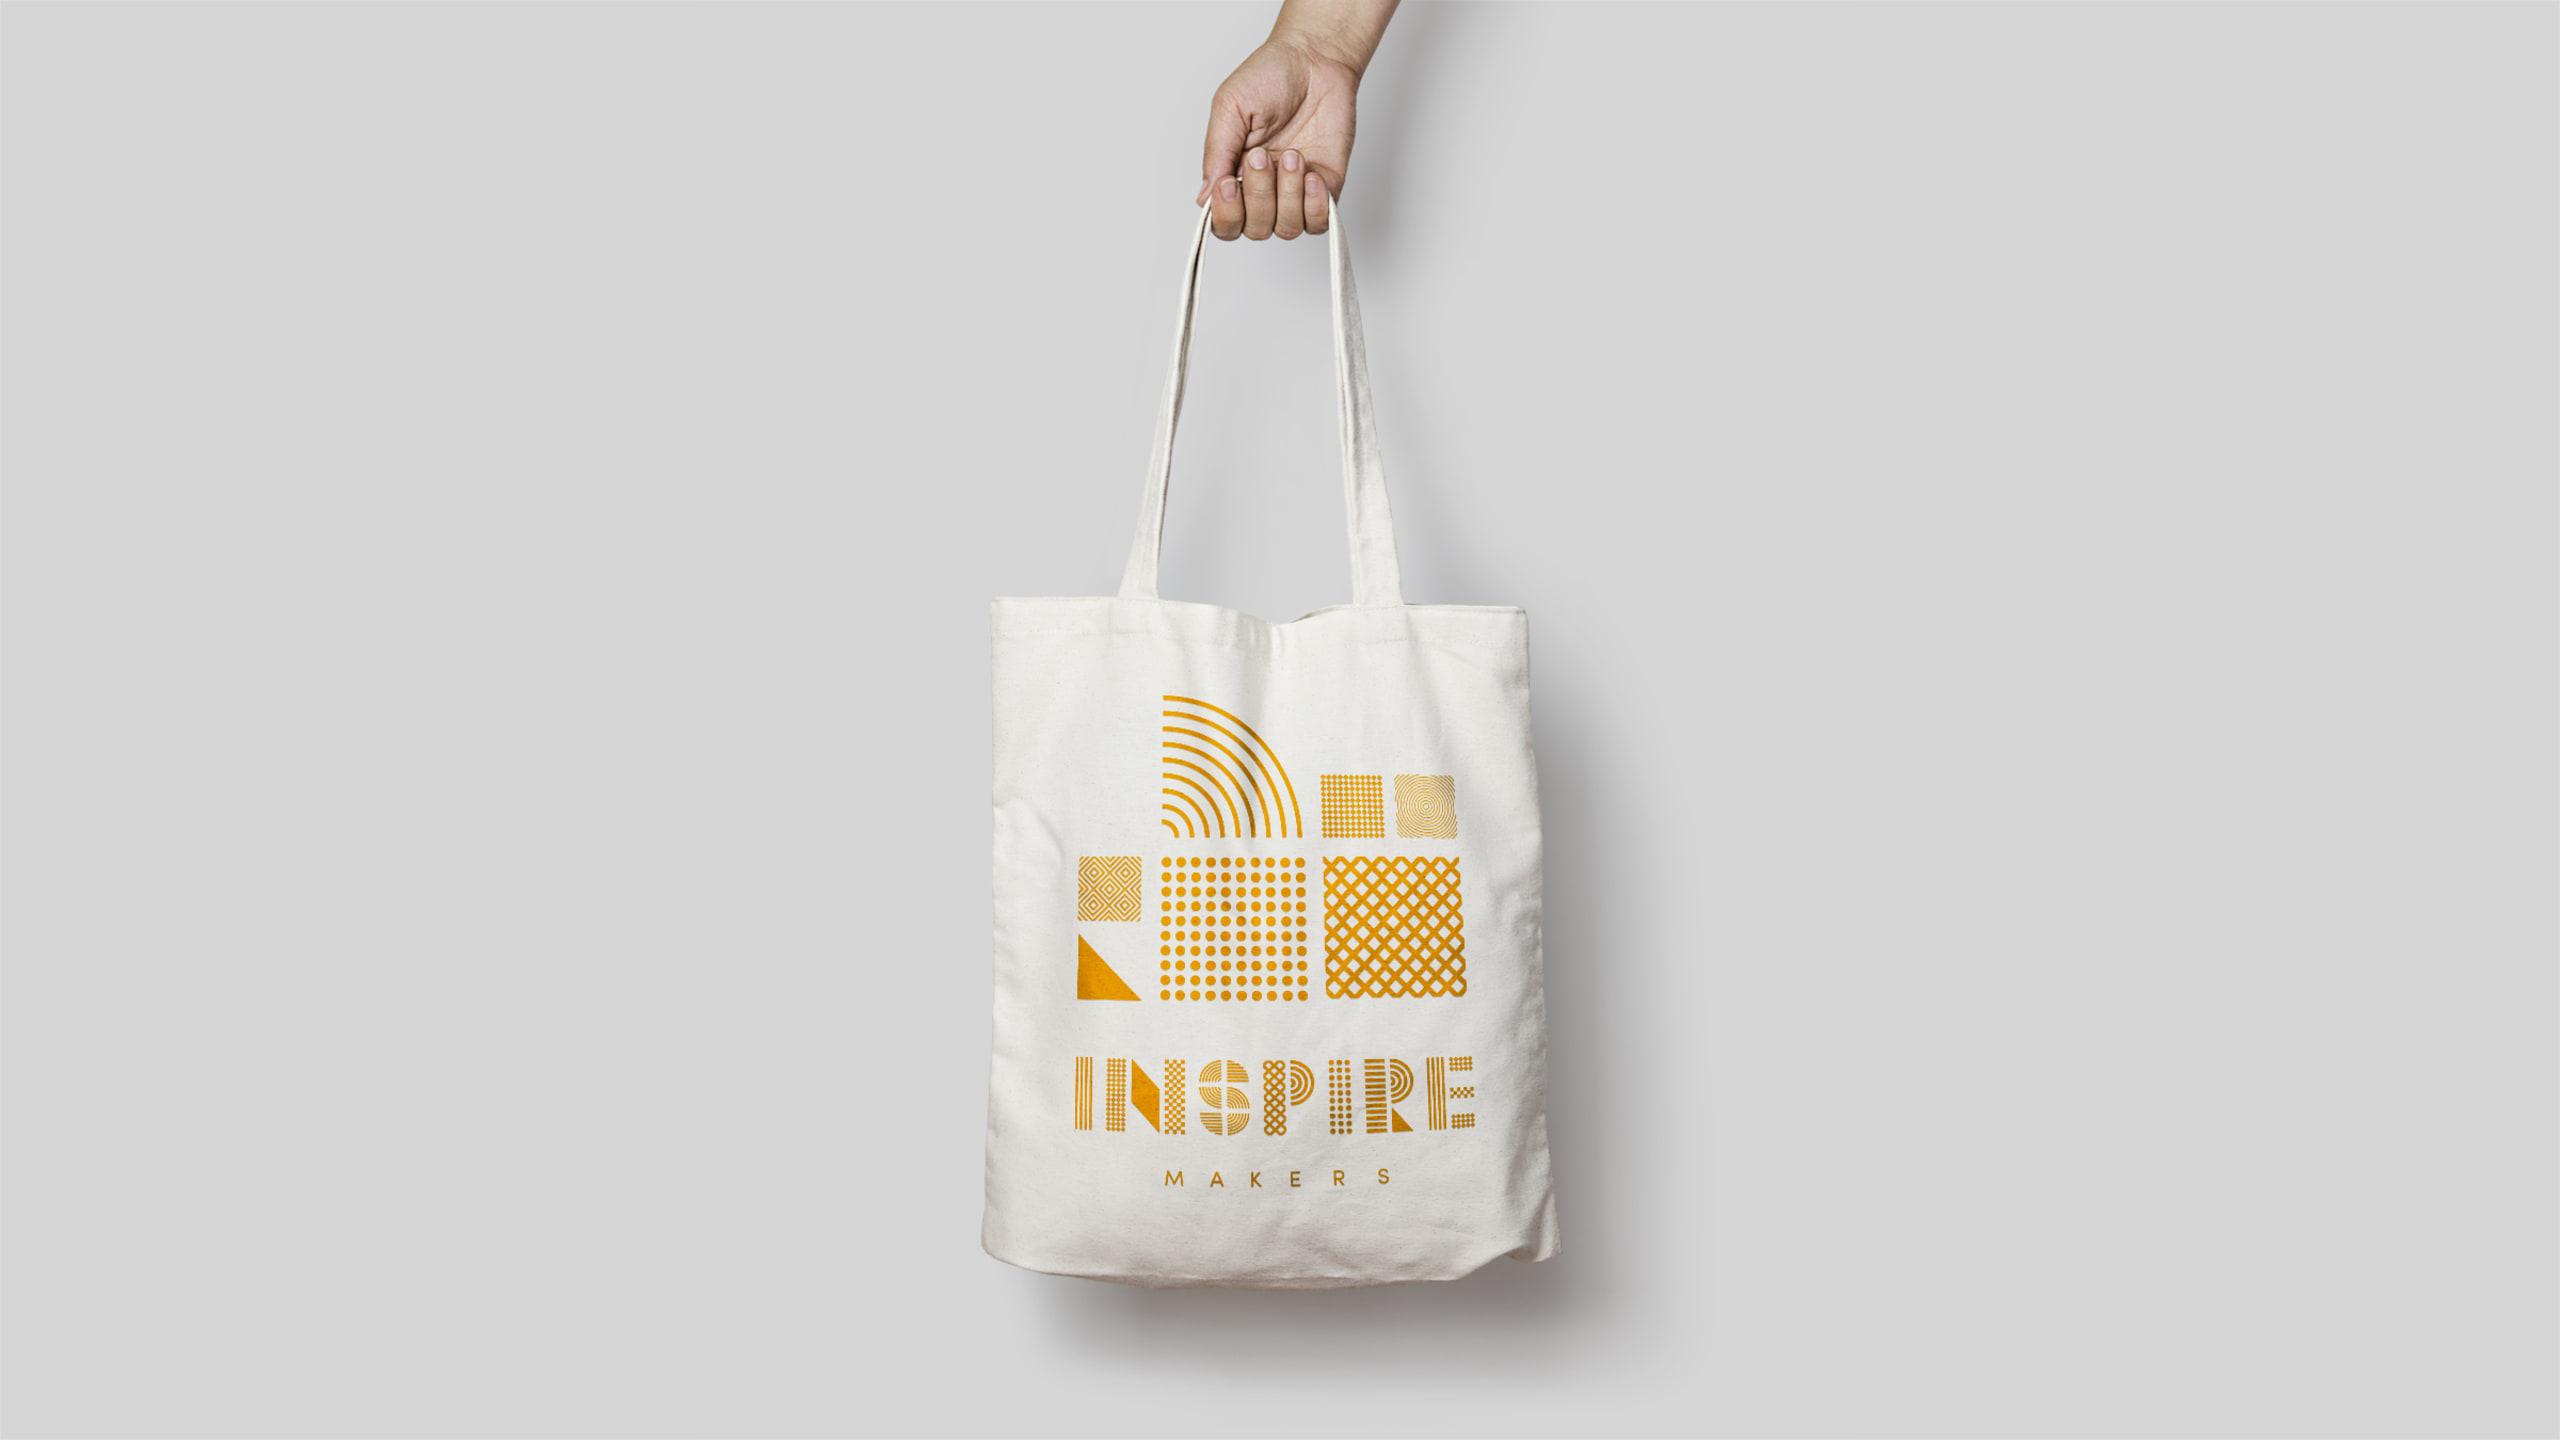 Inspire makers tote bag image